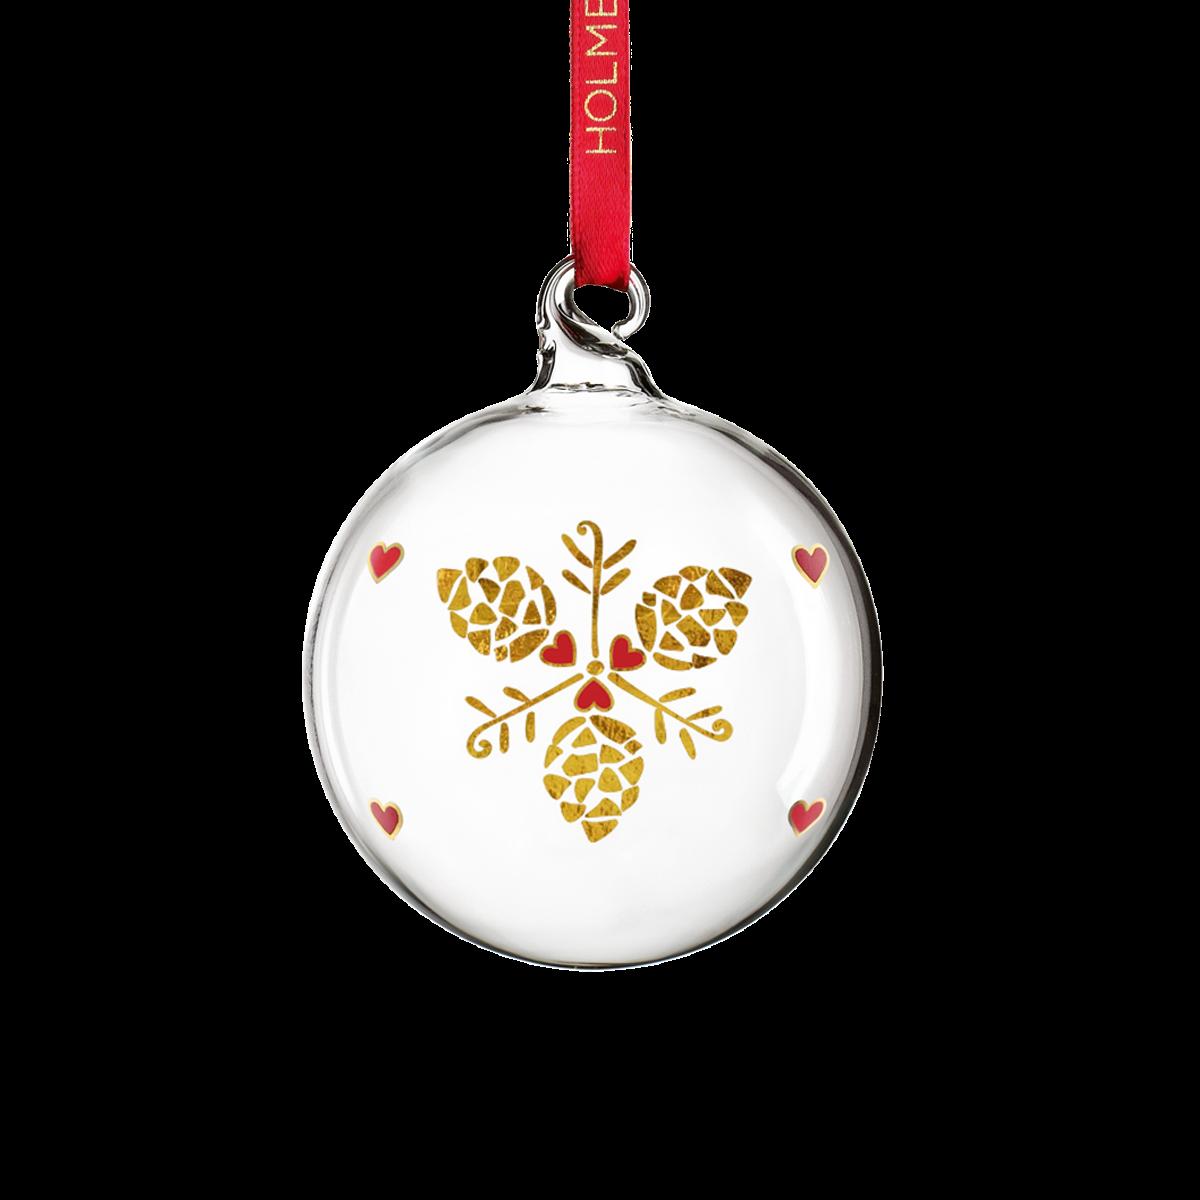 Årets Julekugle anno 2017 er designet af Ann-Sofi Romme